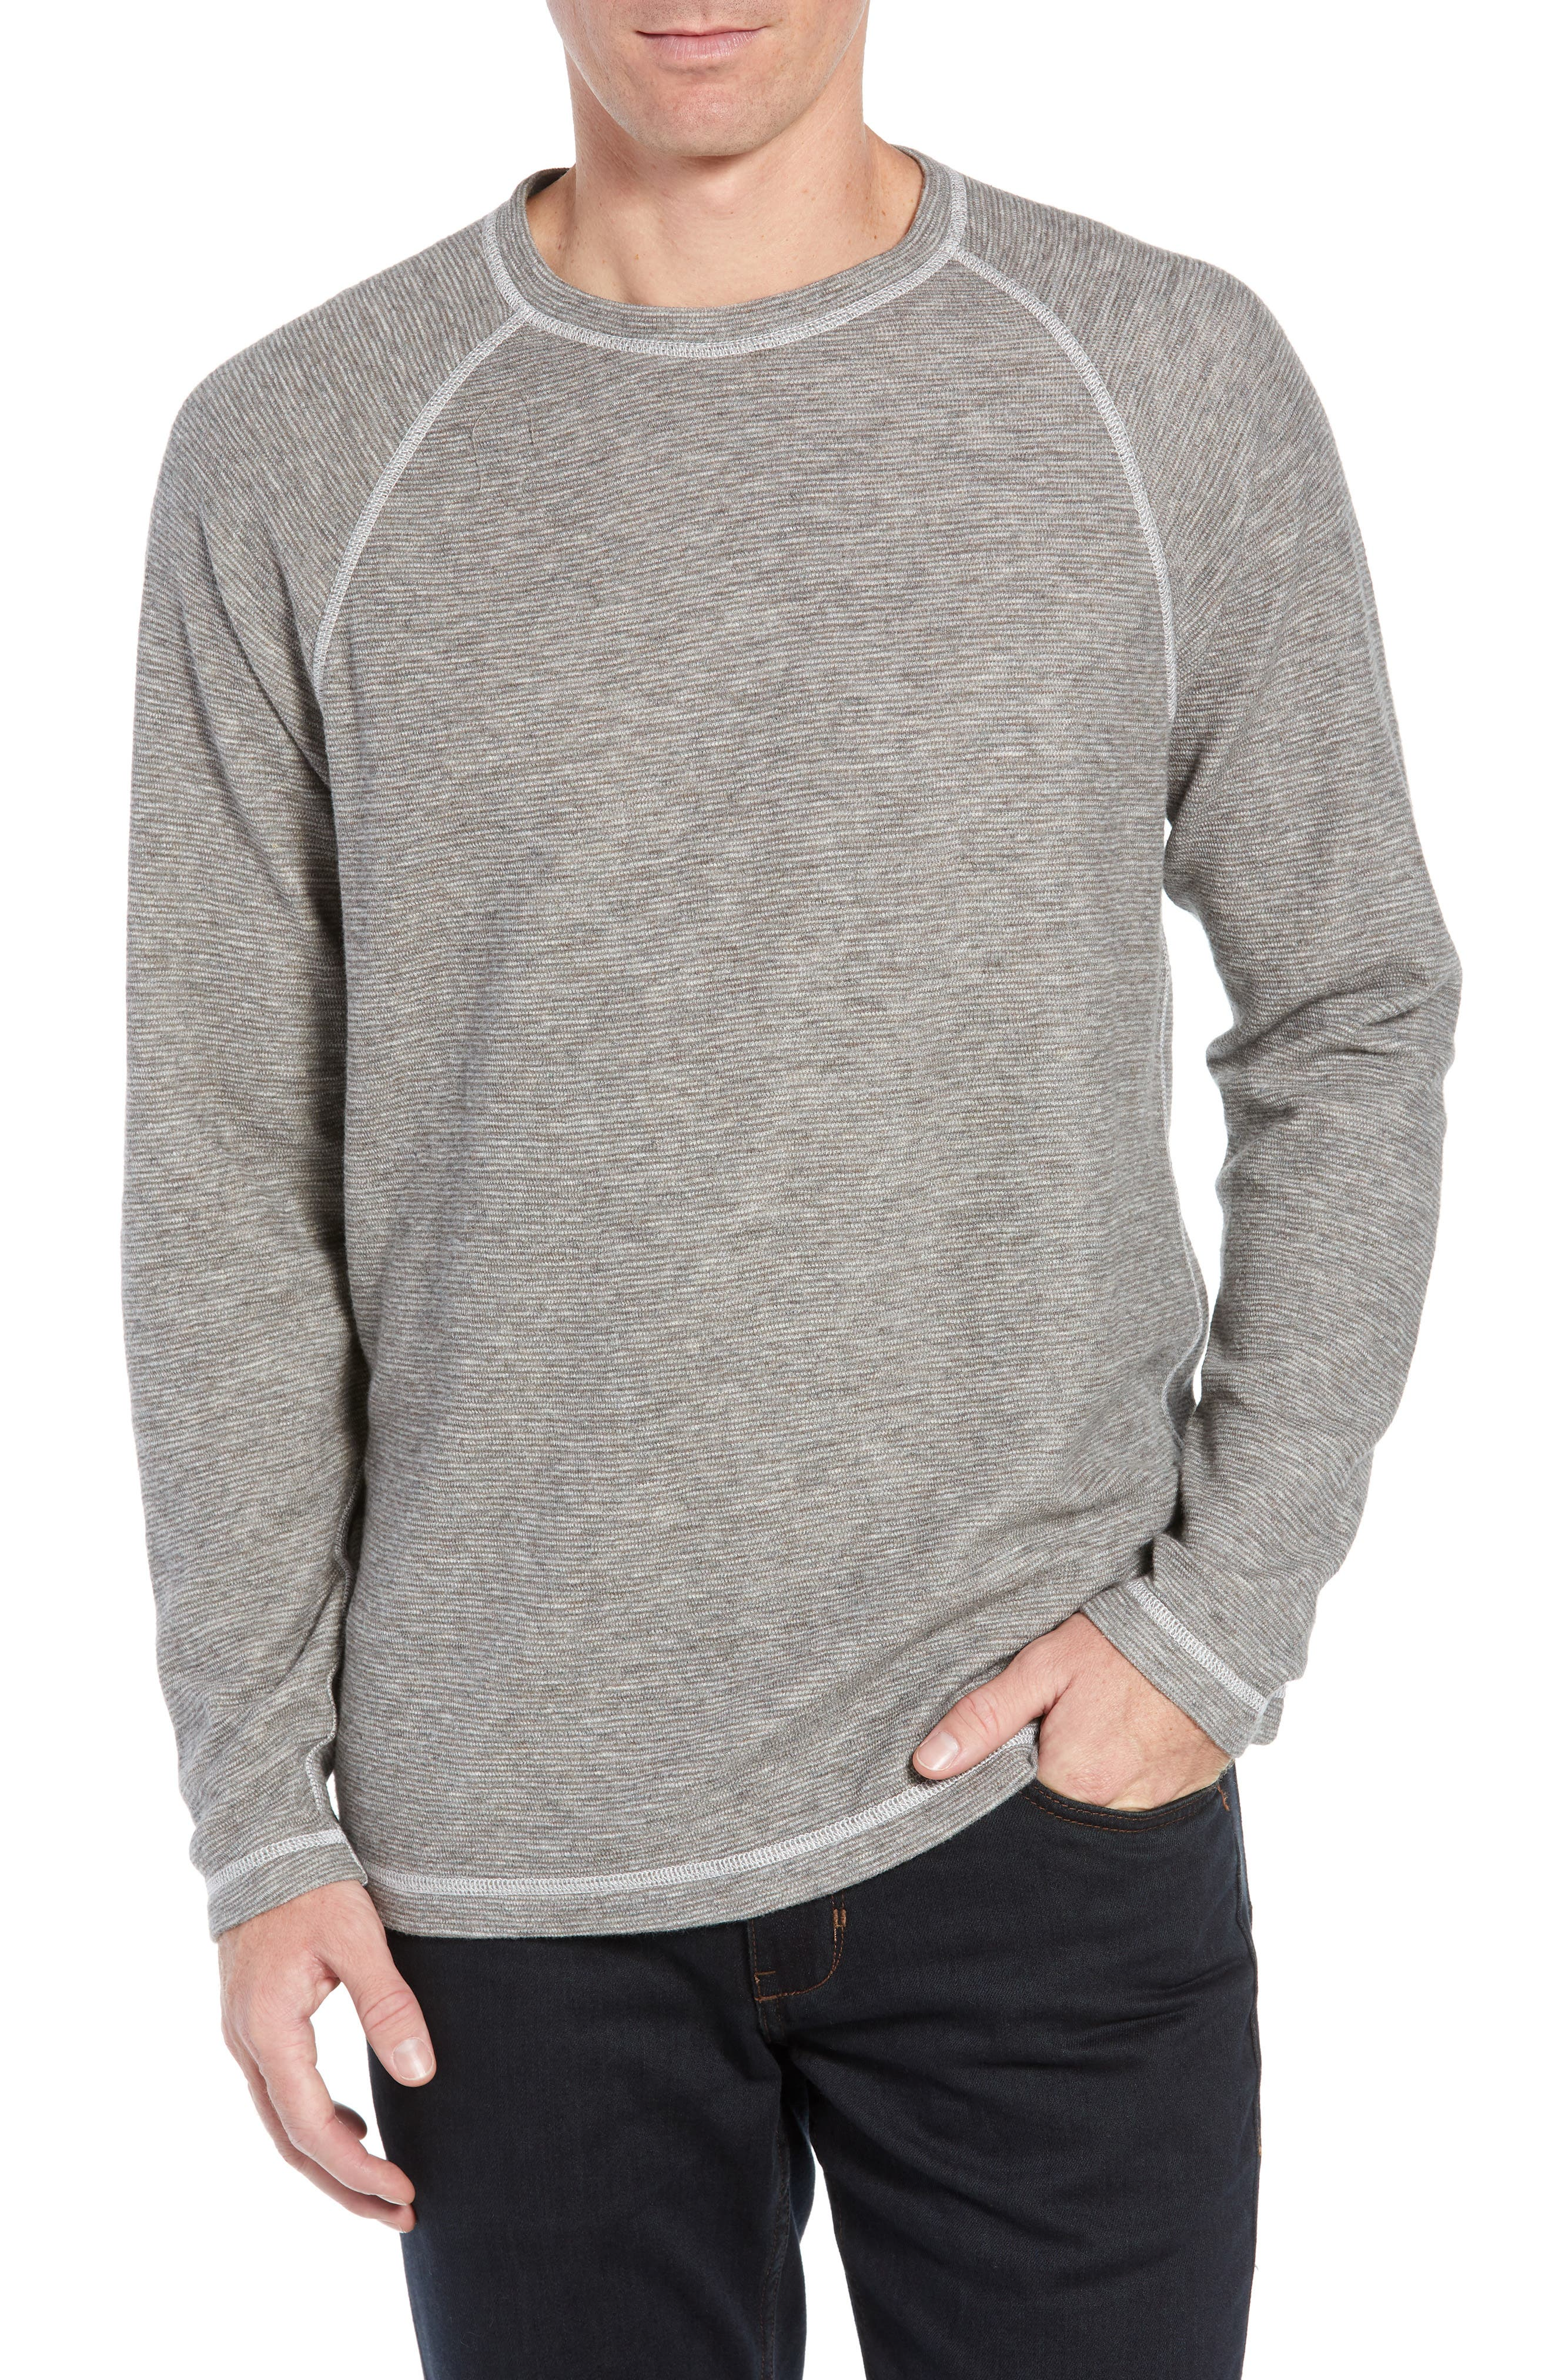 Fortuna Flip Regular Fit Shirt,                             Main thumbnail 1, color,                             TAUPE HEATHER